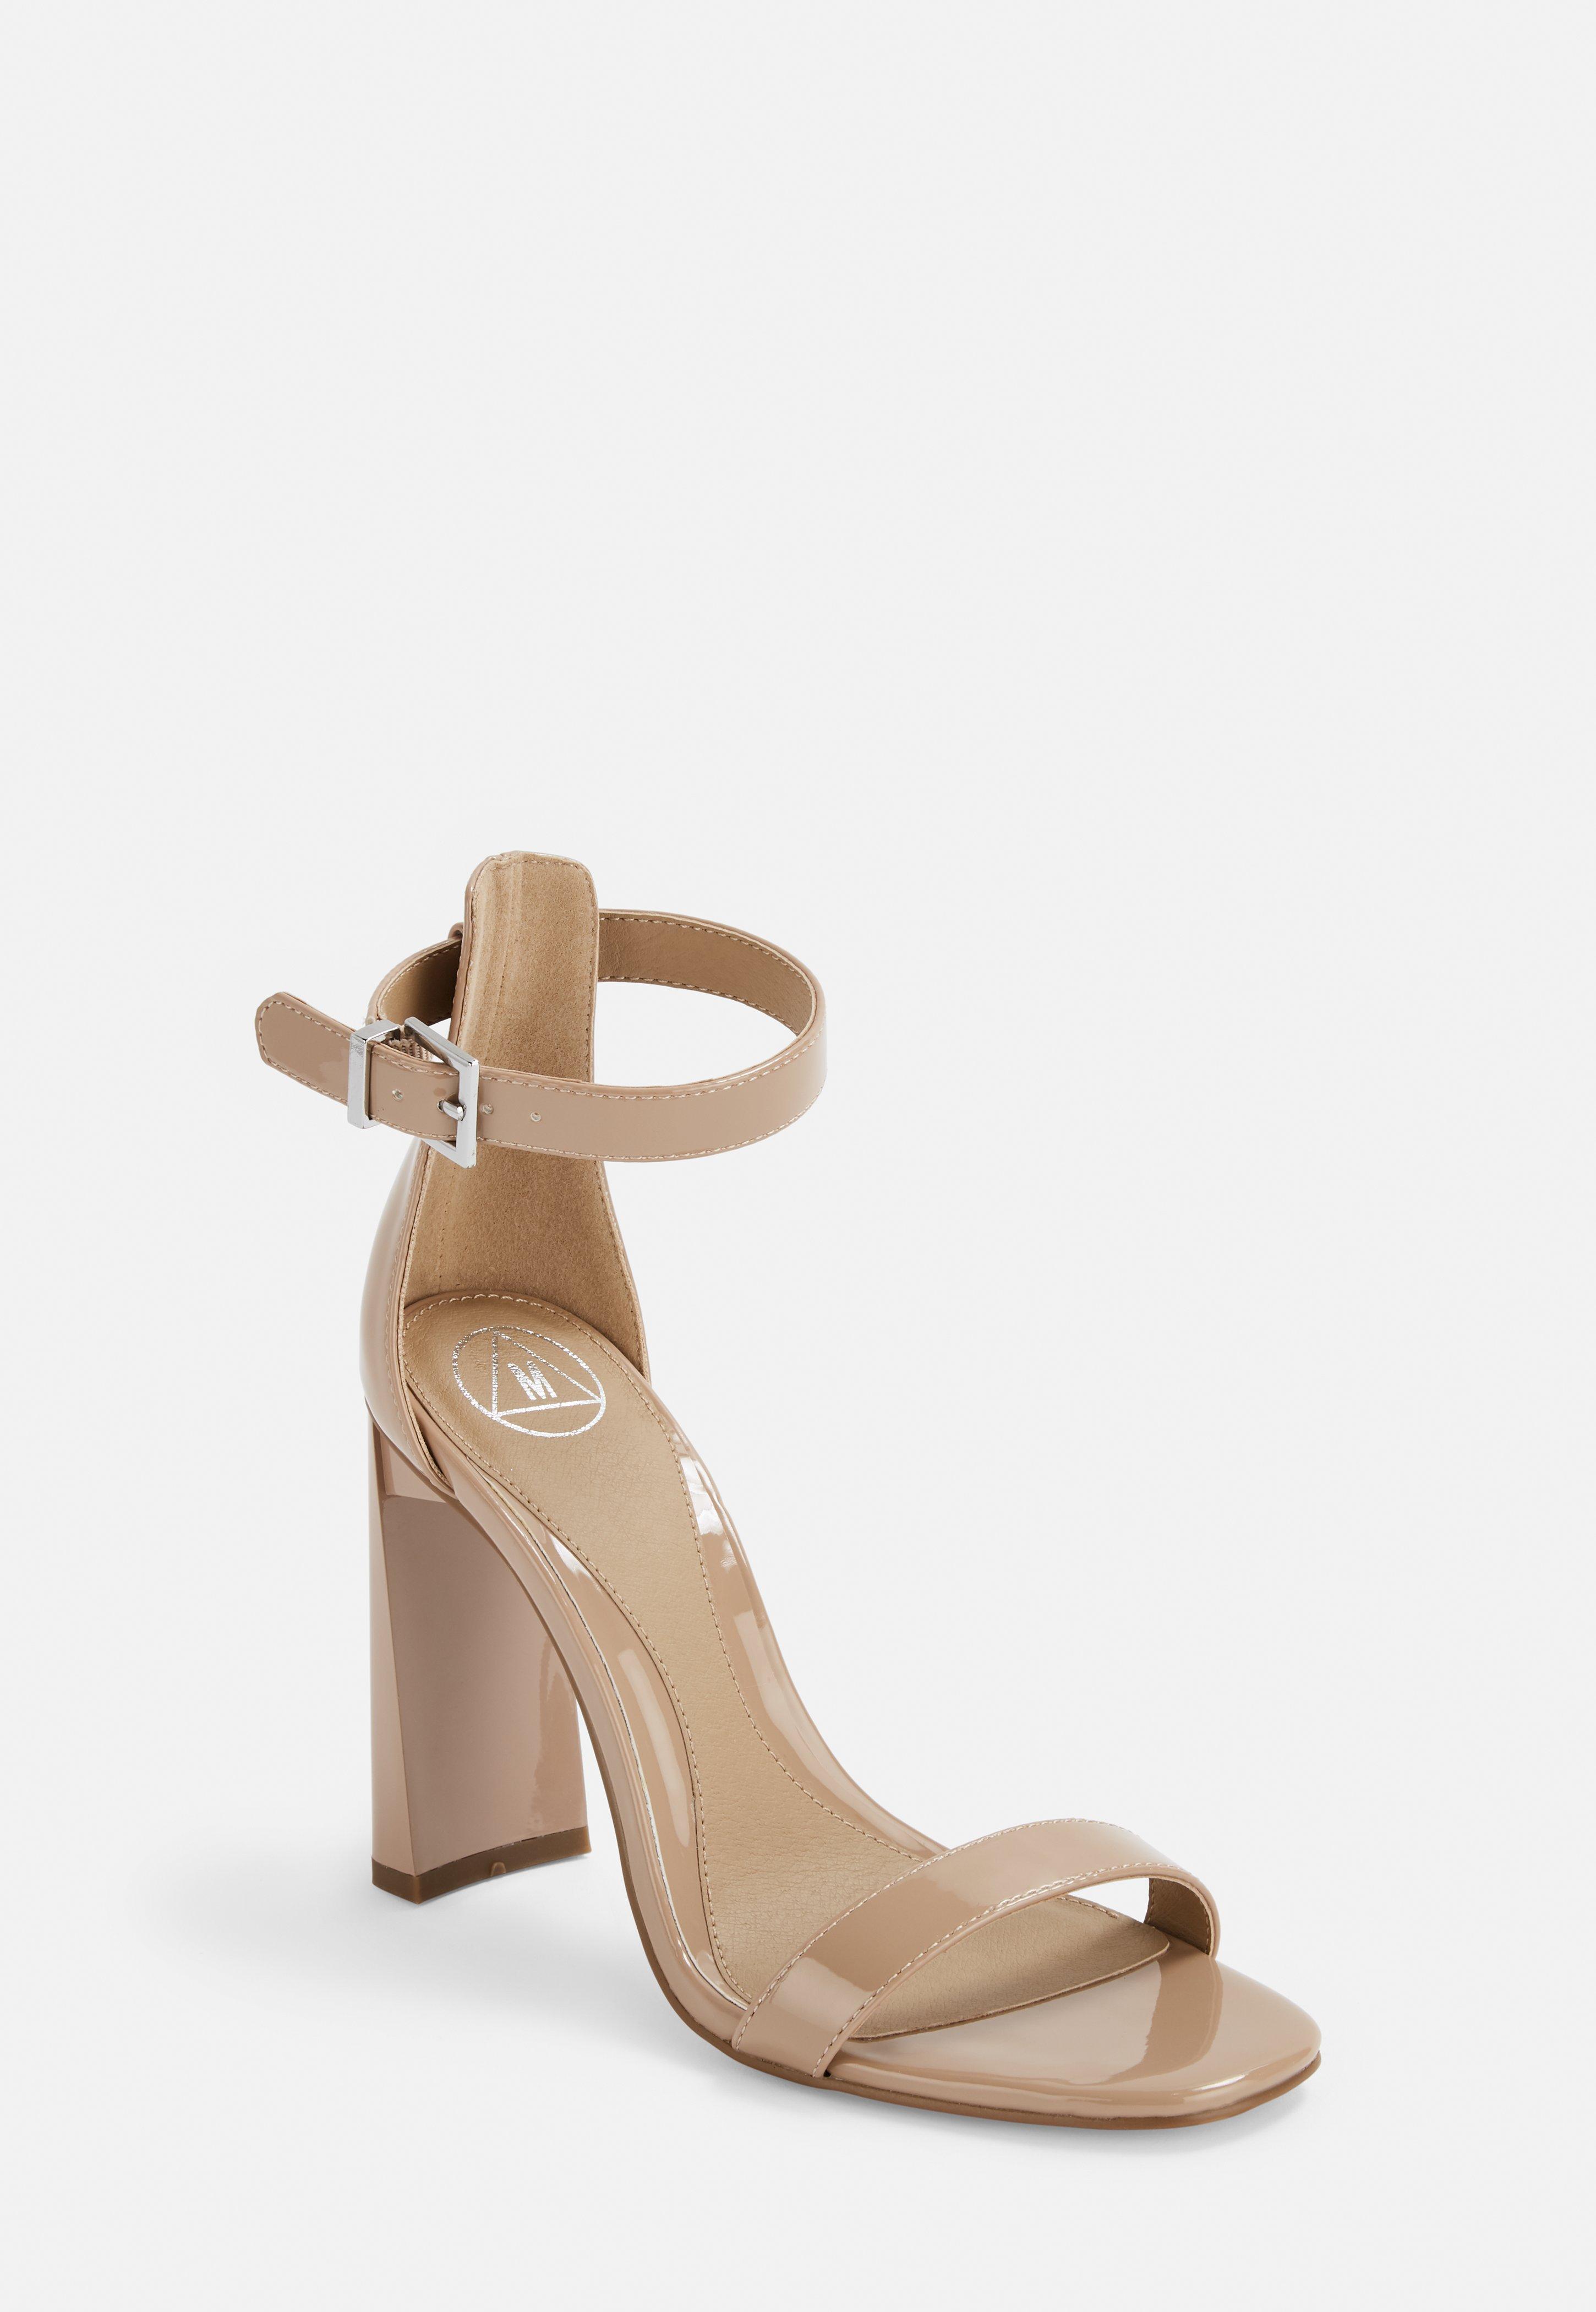 6a844bbb1d Shoes   Women's Footwear Online UK - Missguided